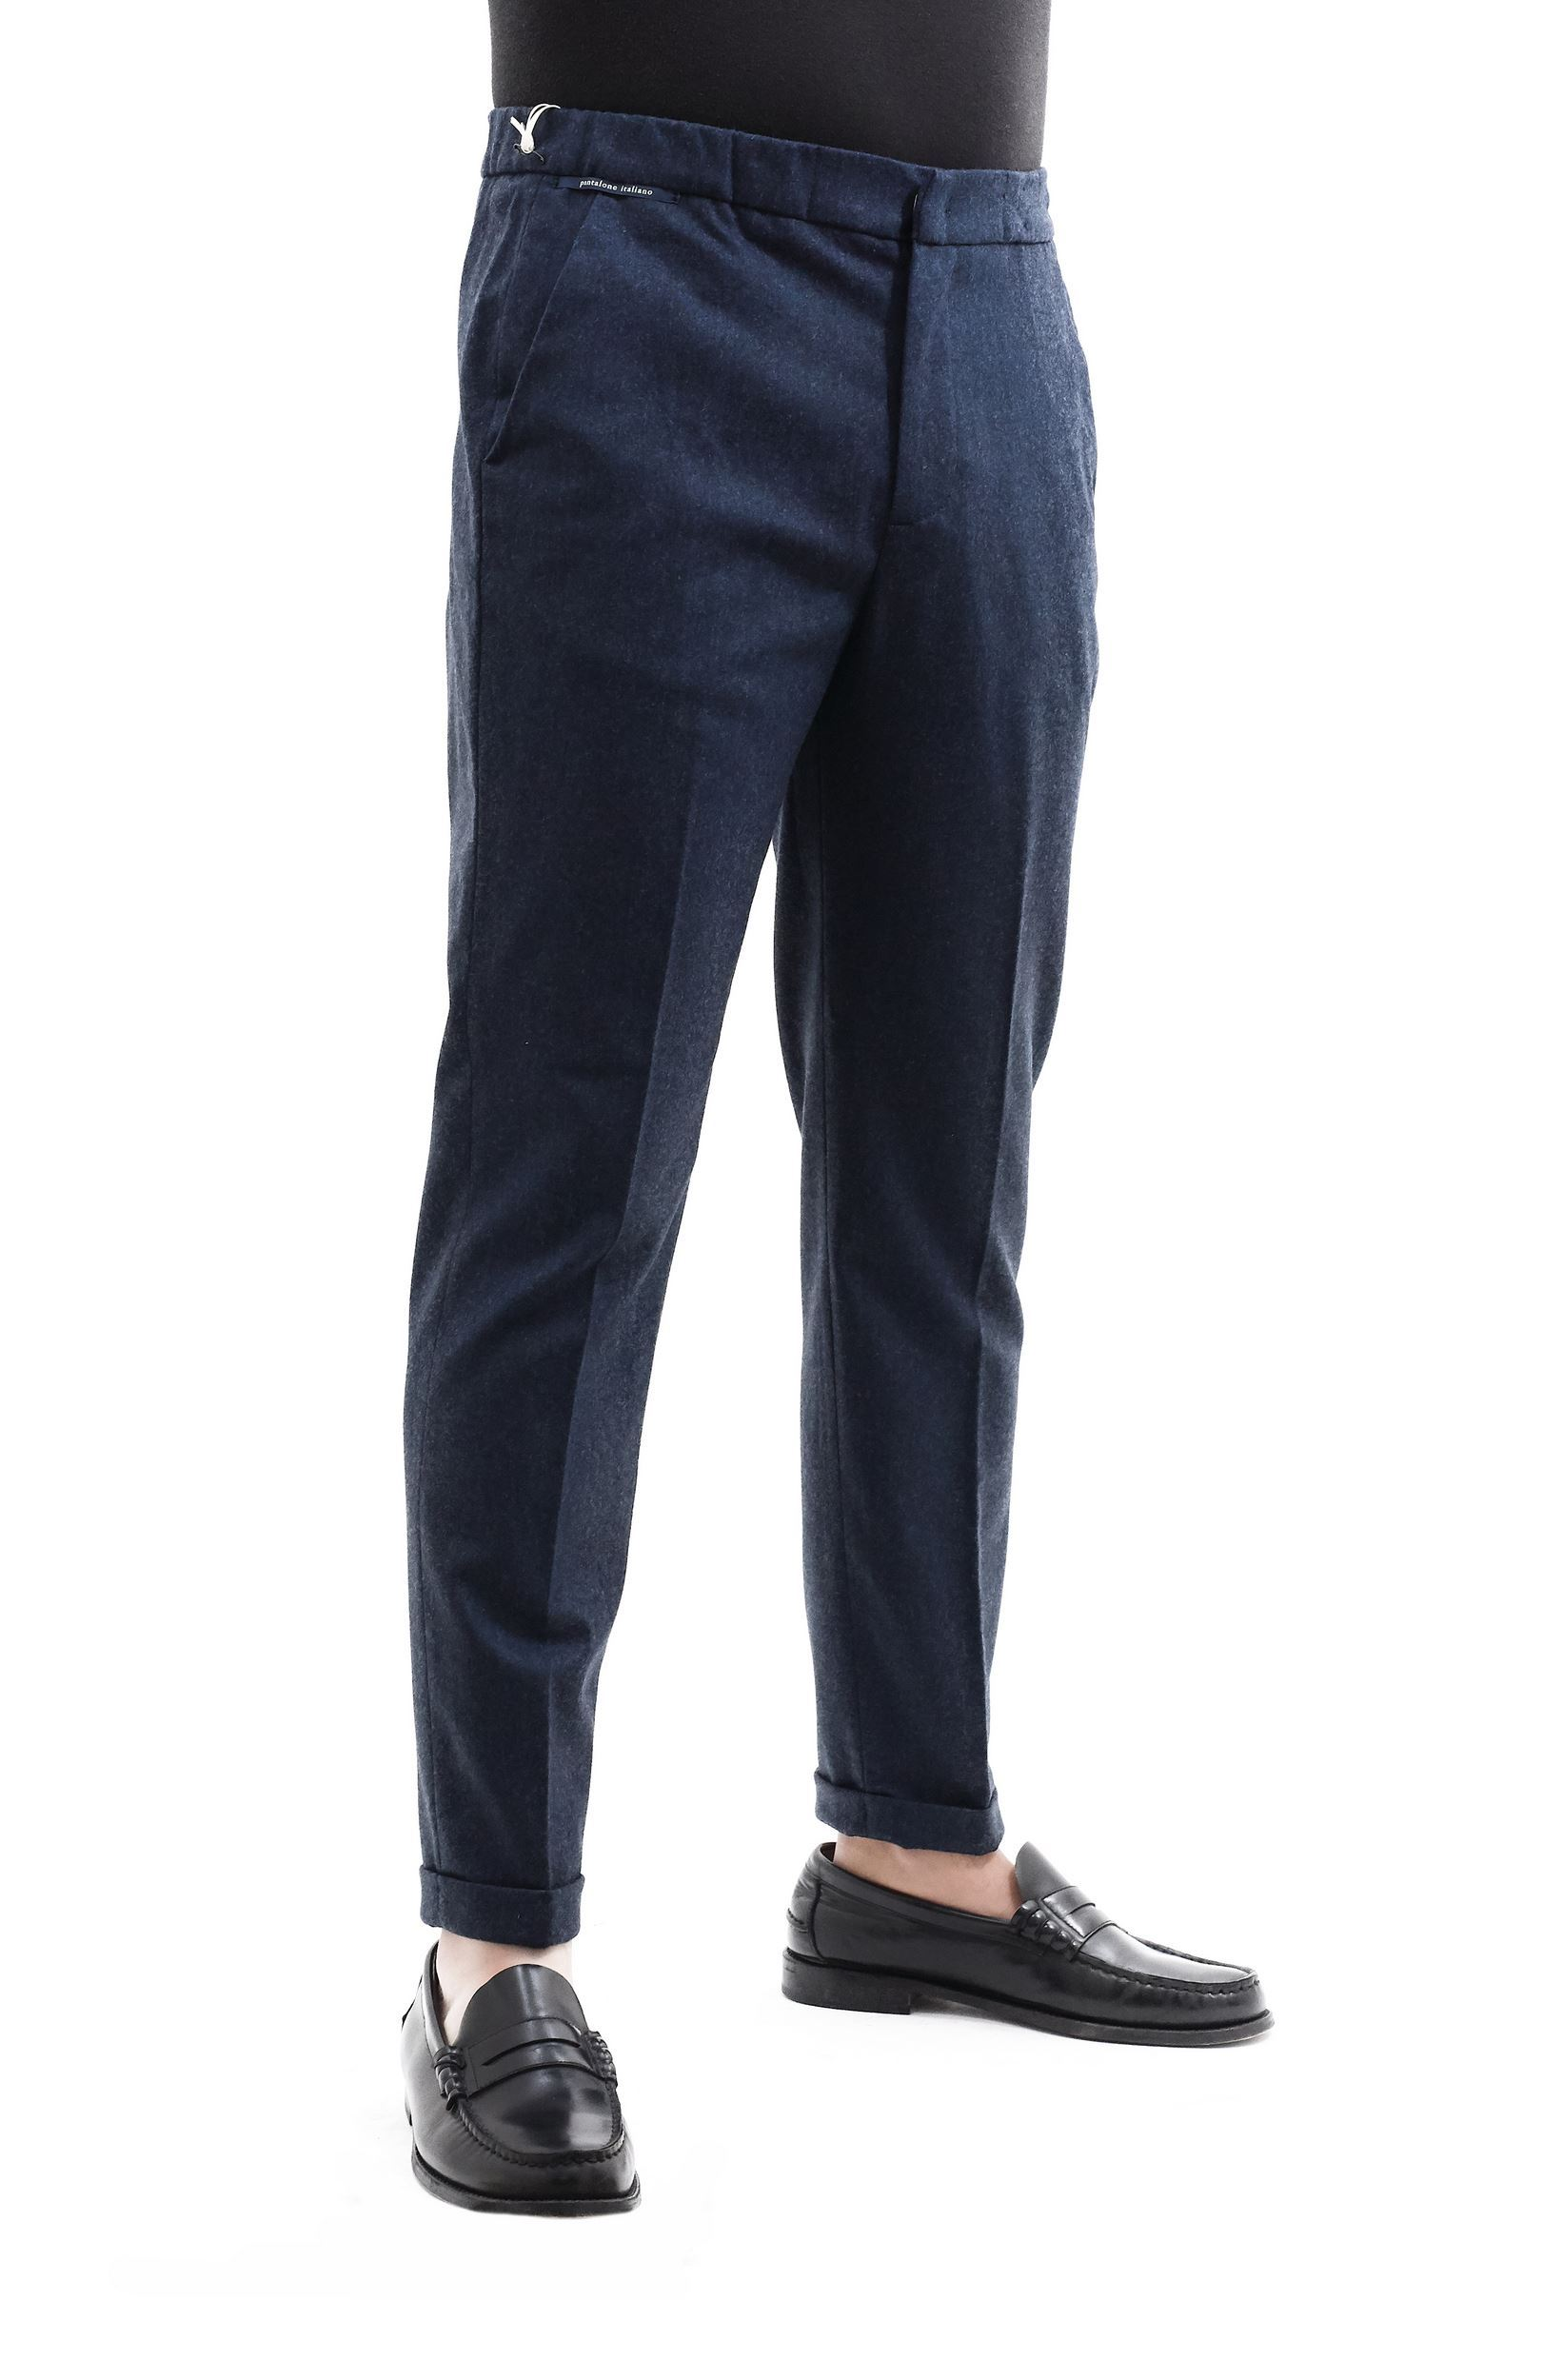 Immagine di Pantalone lana blu con coulisse